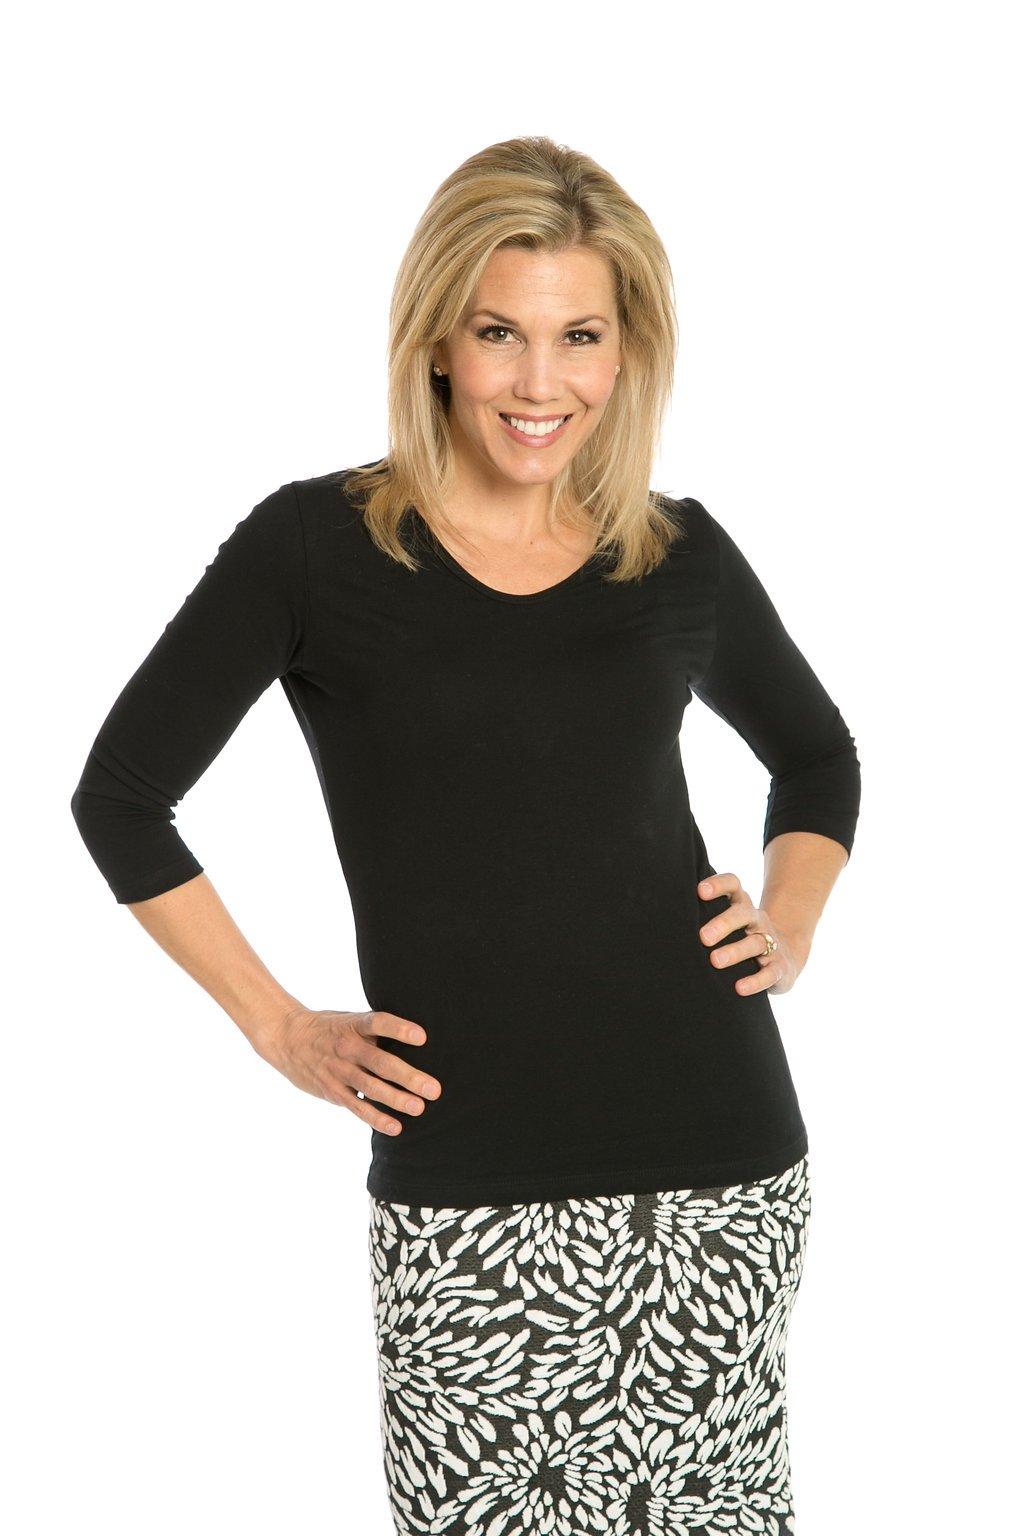 Heirloom Clothing 3/4 Sleeve V-Neck Top 5PK 5 Black 1XLarge by Heirloom Clothing